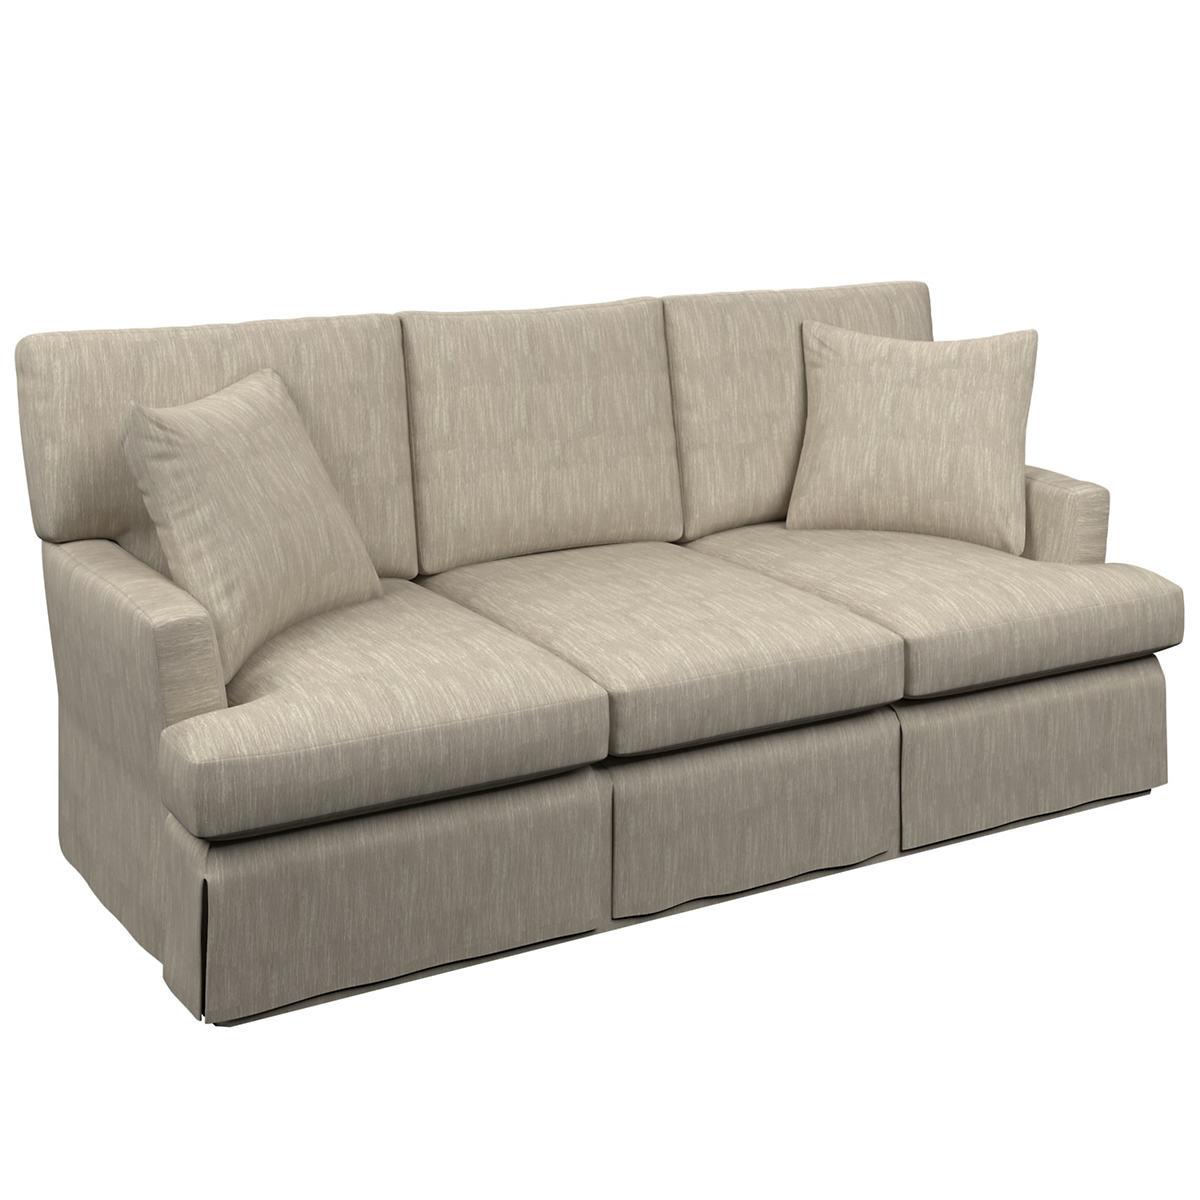 Graduate Linen Saybrook 3 Seater Sofa